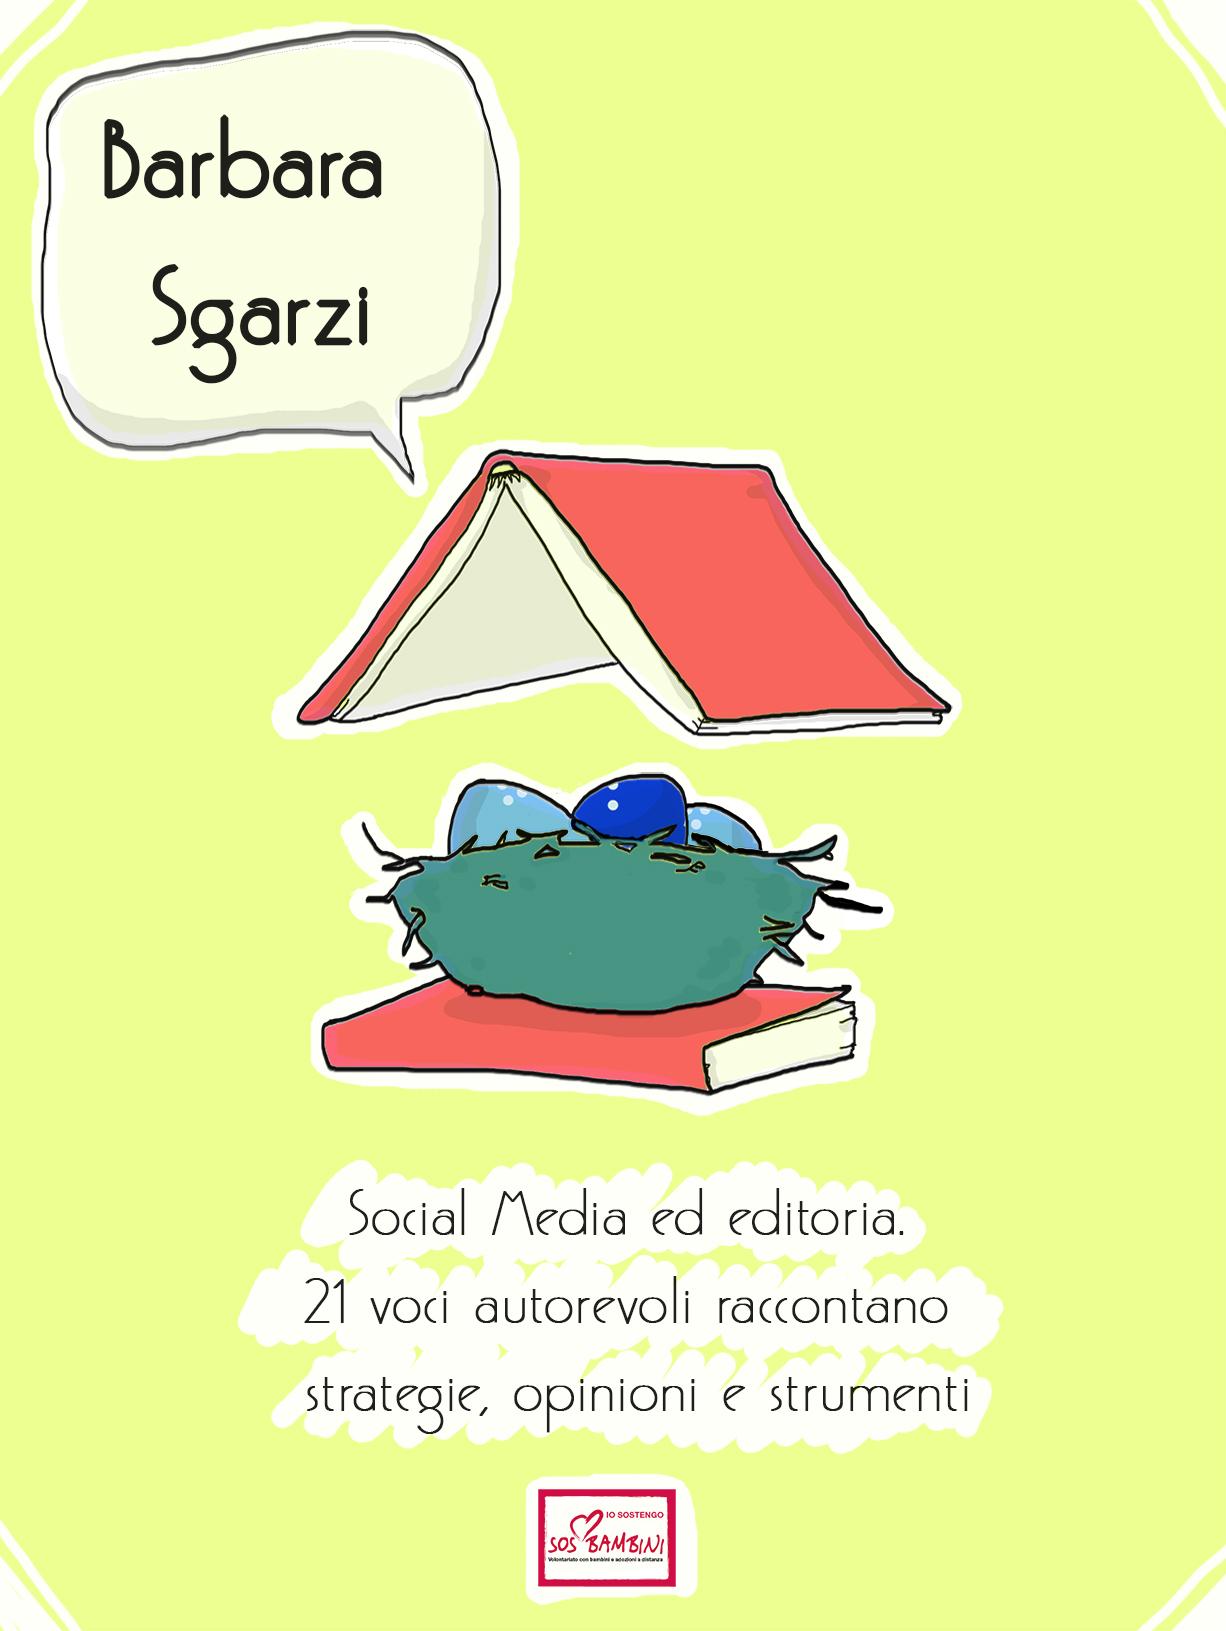 socialmediaeditoria3